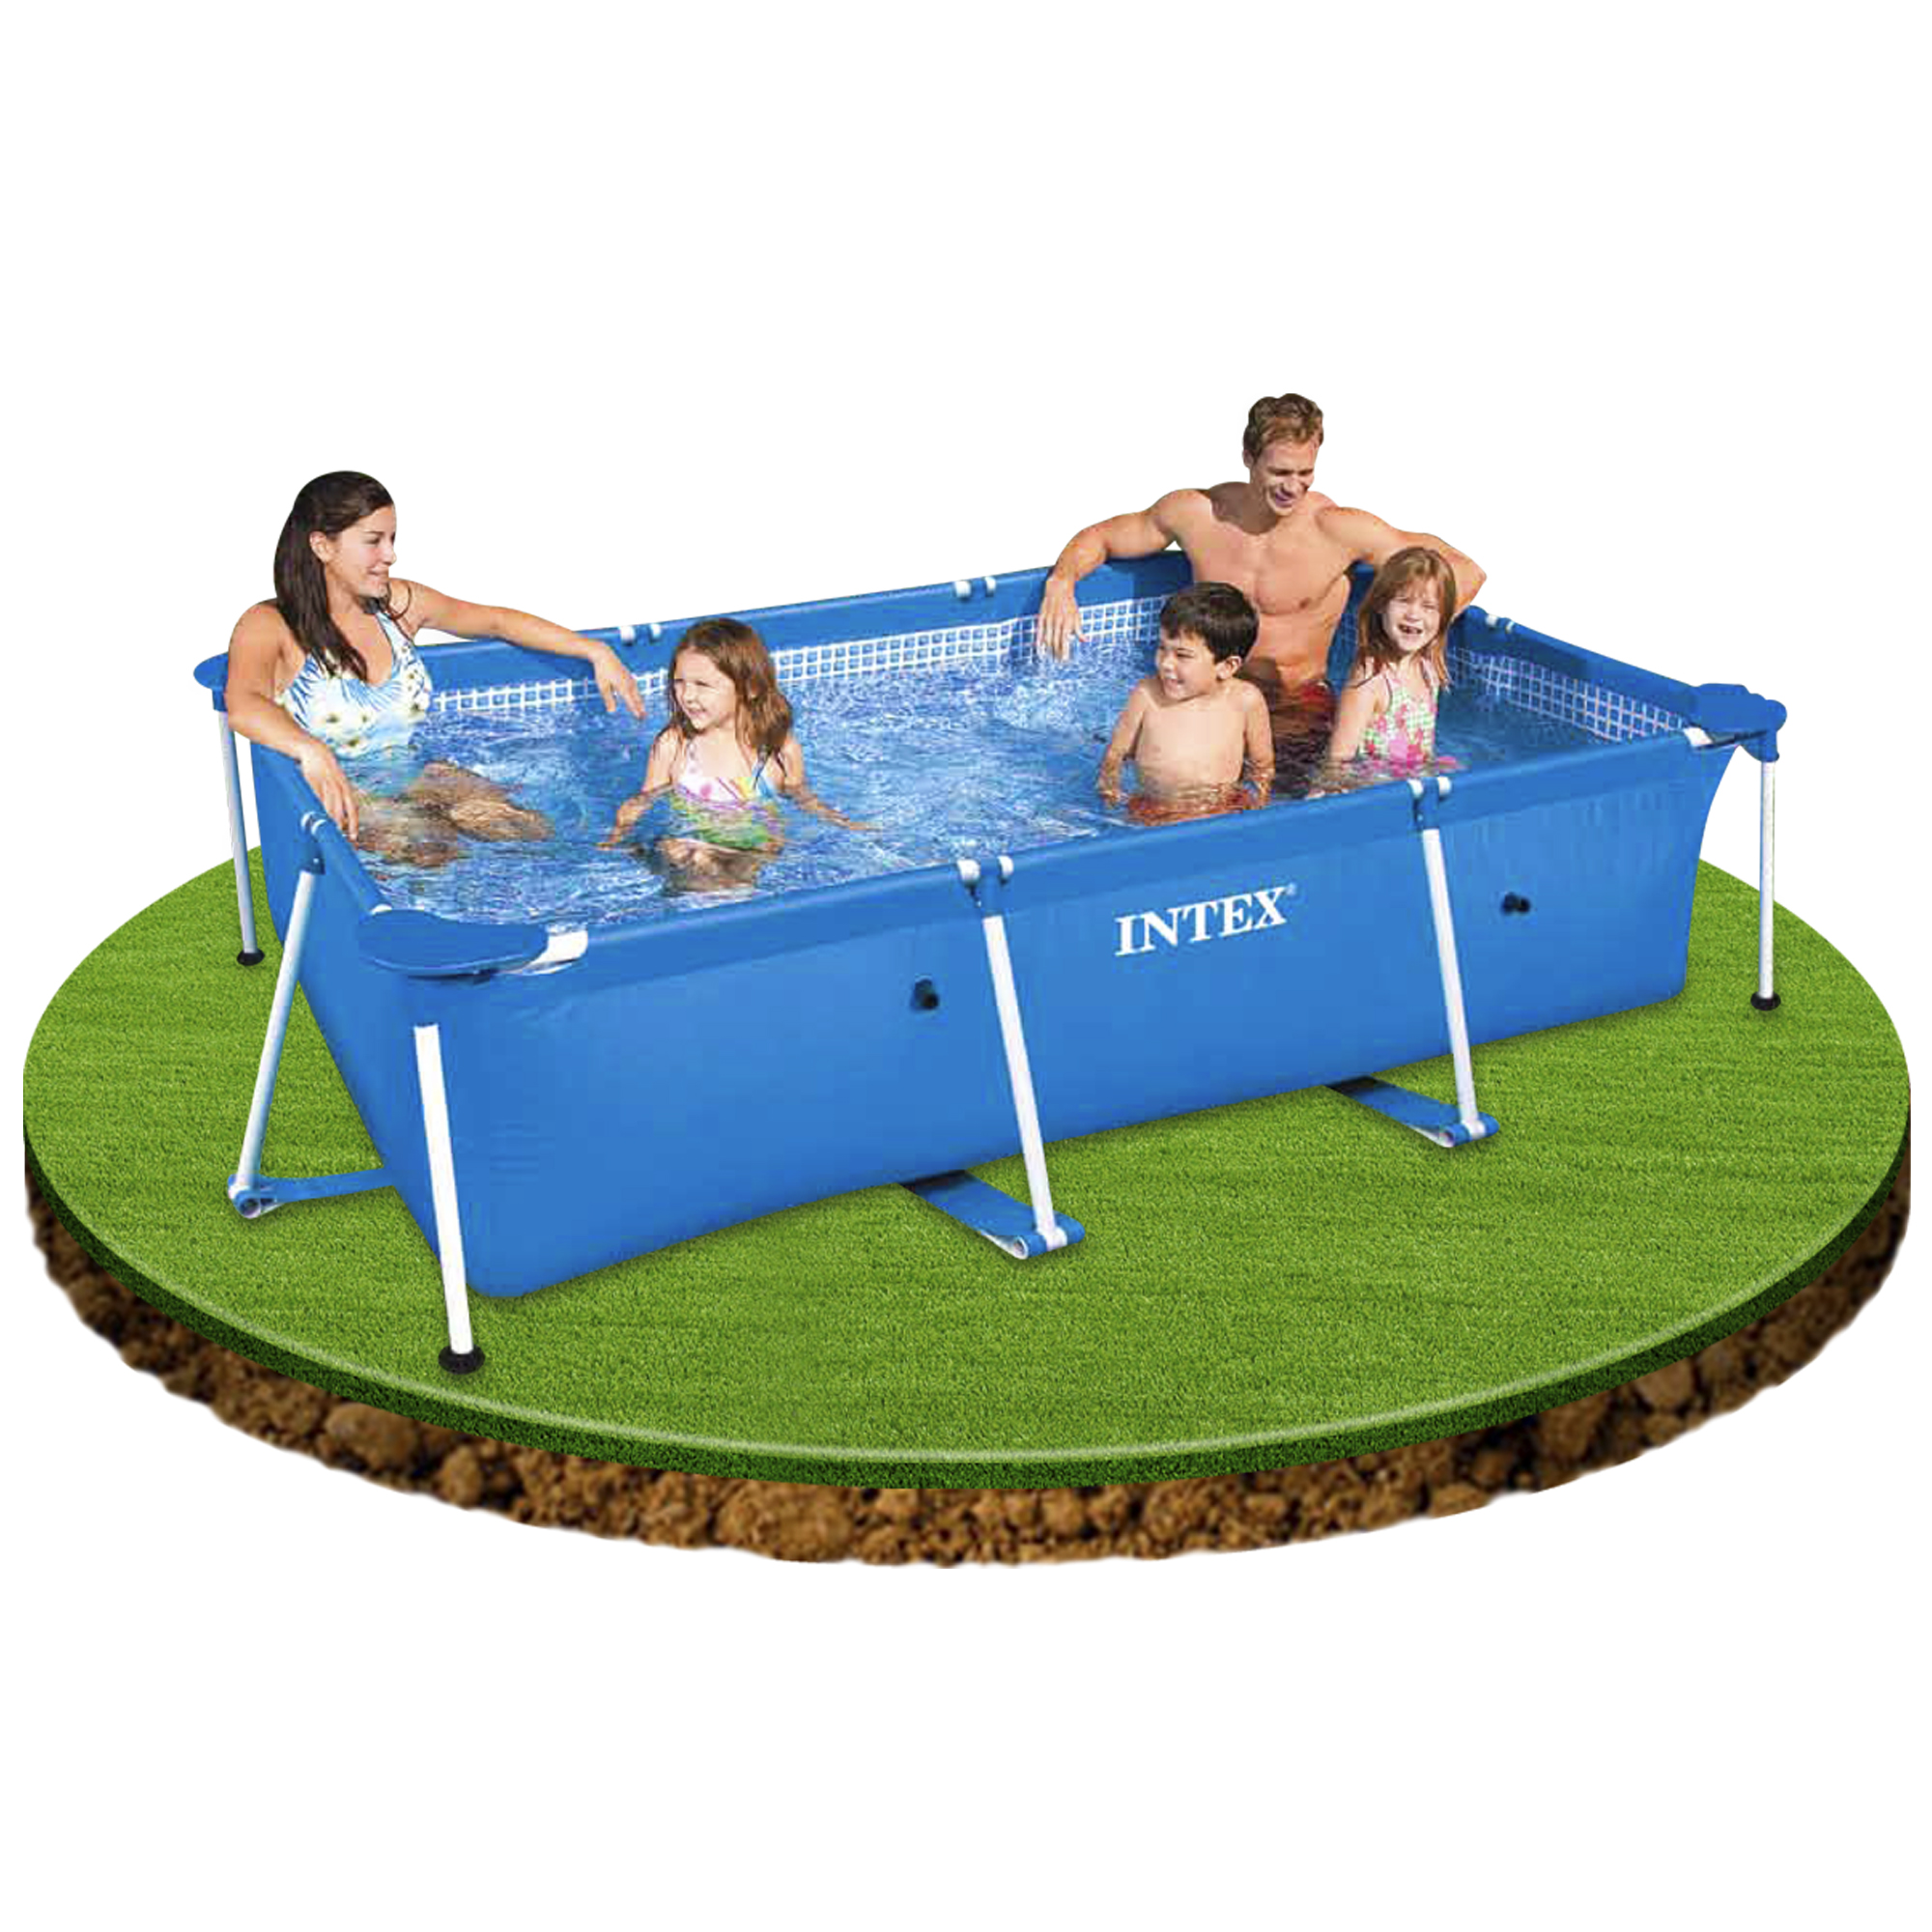 Piscina intex small rectangular frame piscinas desmontables for Piscinas para ninos pequenos